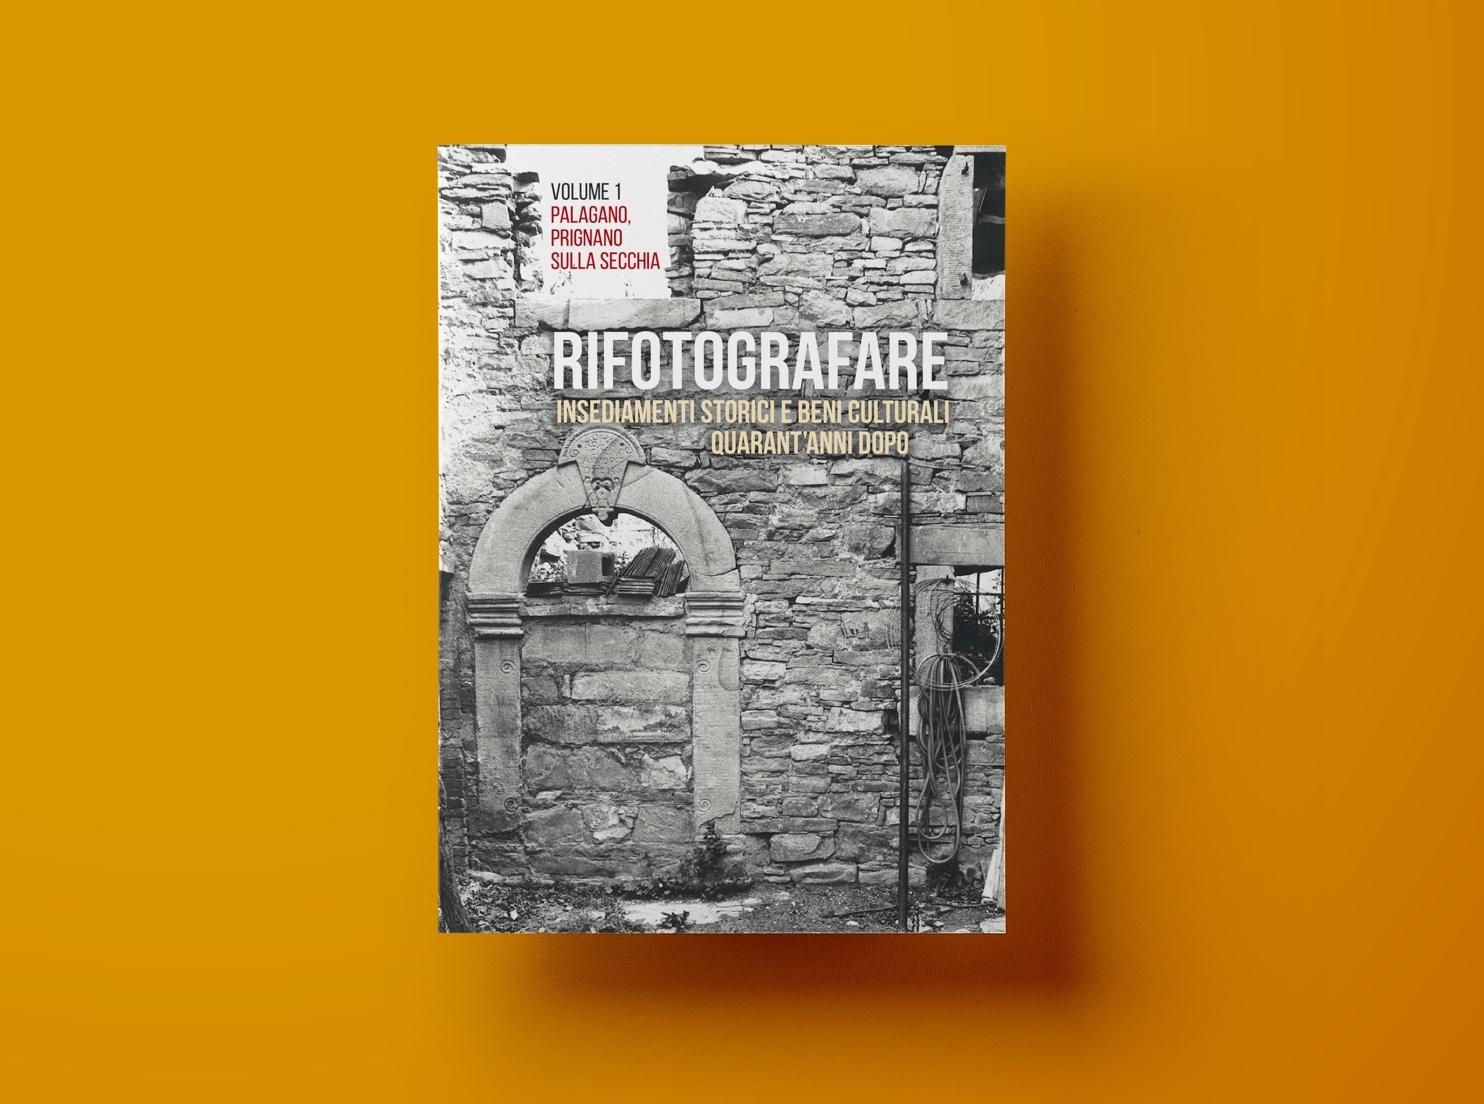 Rifotografare I - Palagano, Prignano